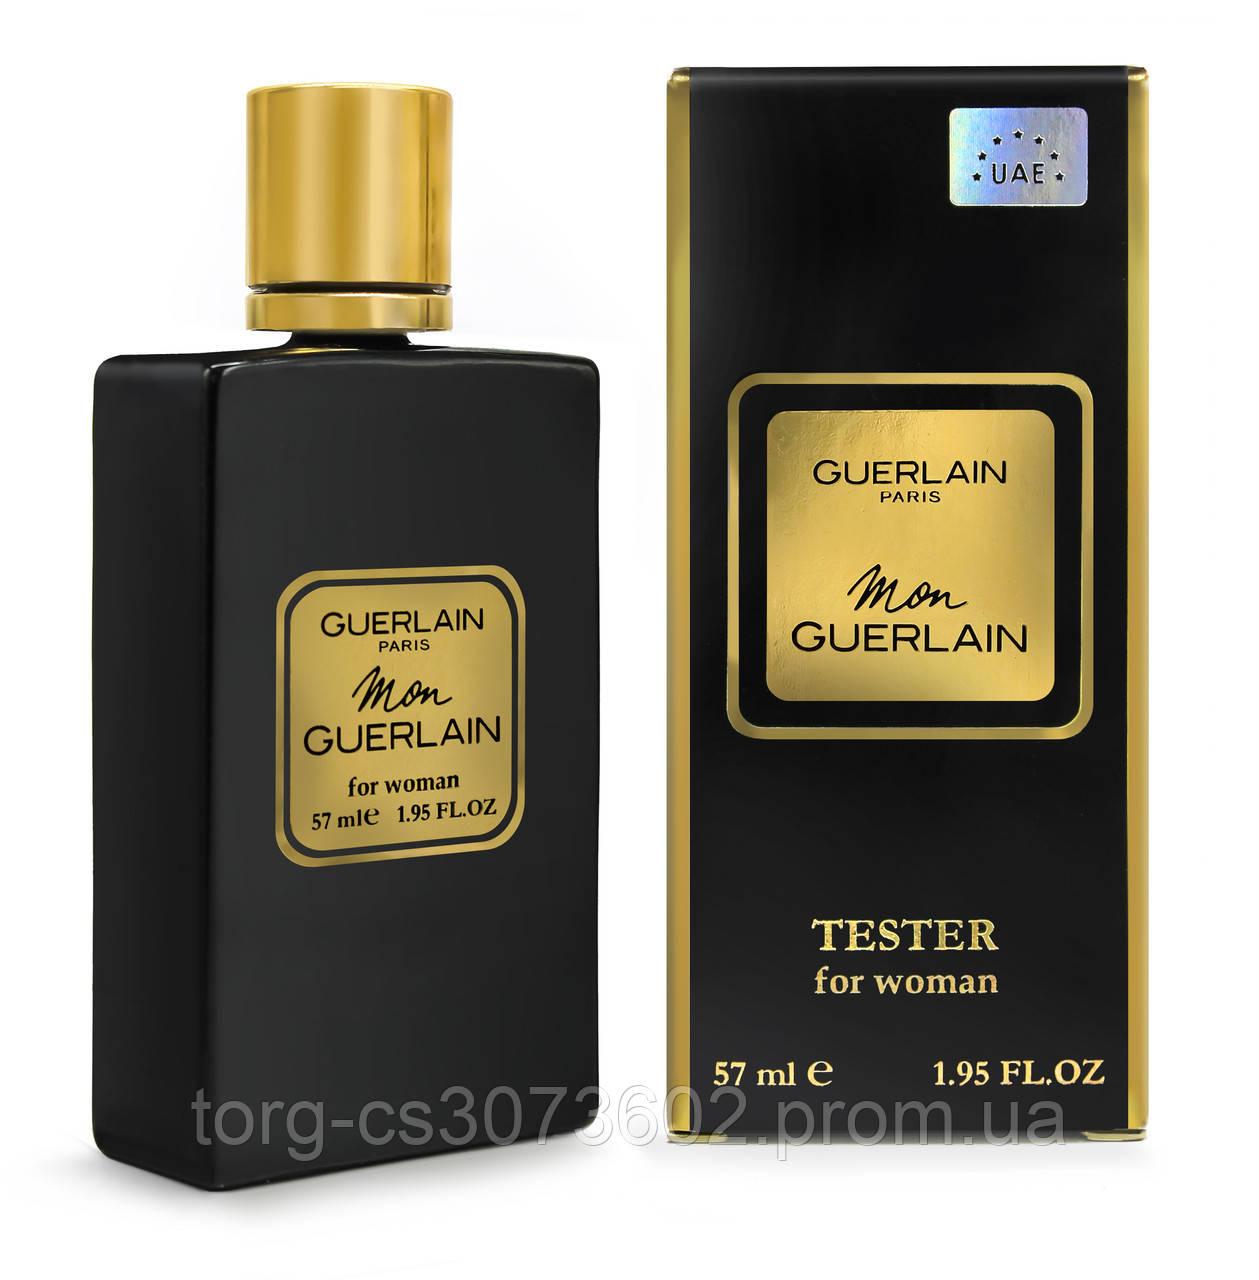 Тестер женский Guerlain Mon Guerlain, 57 мл.